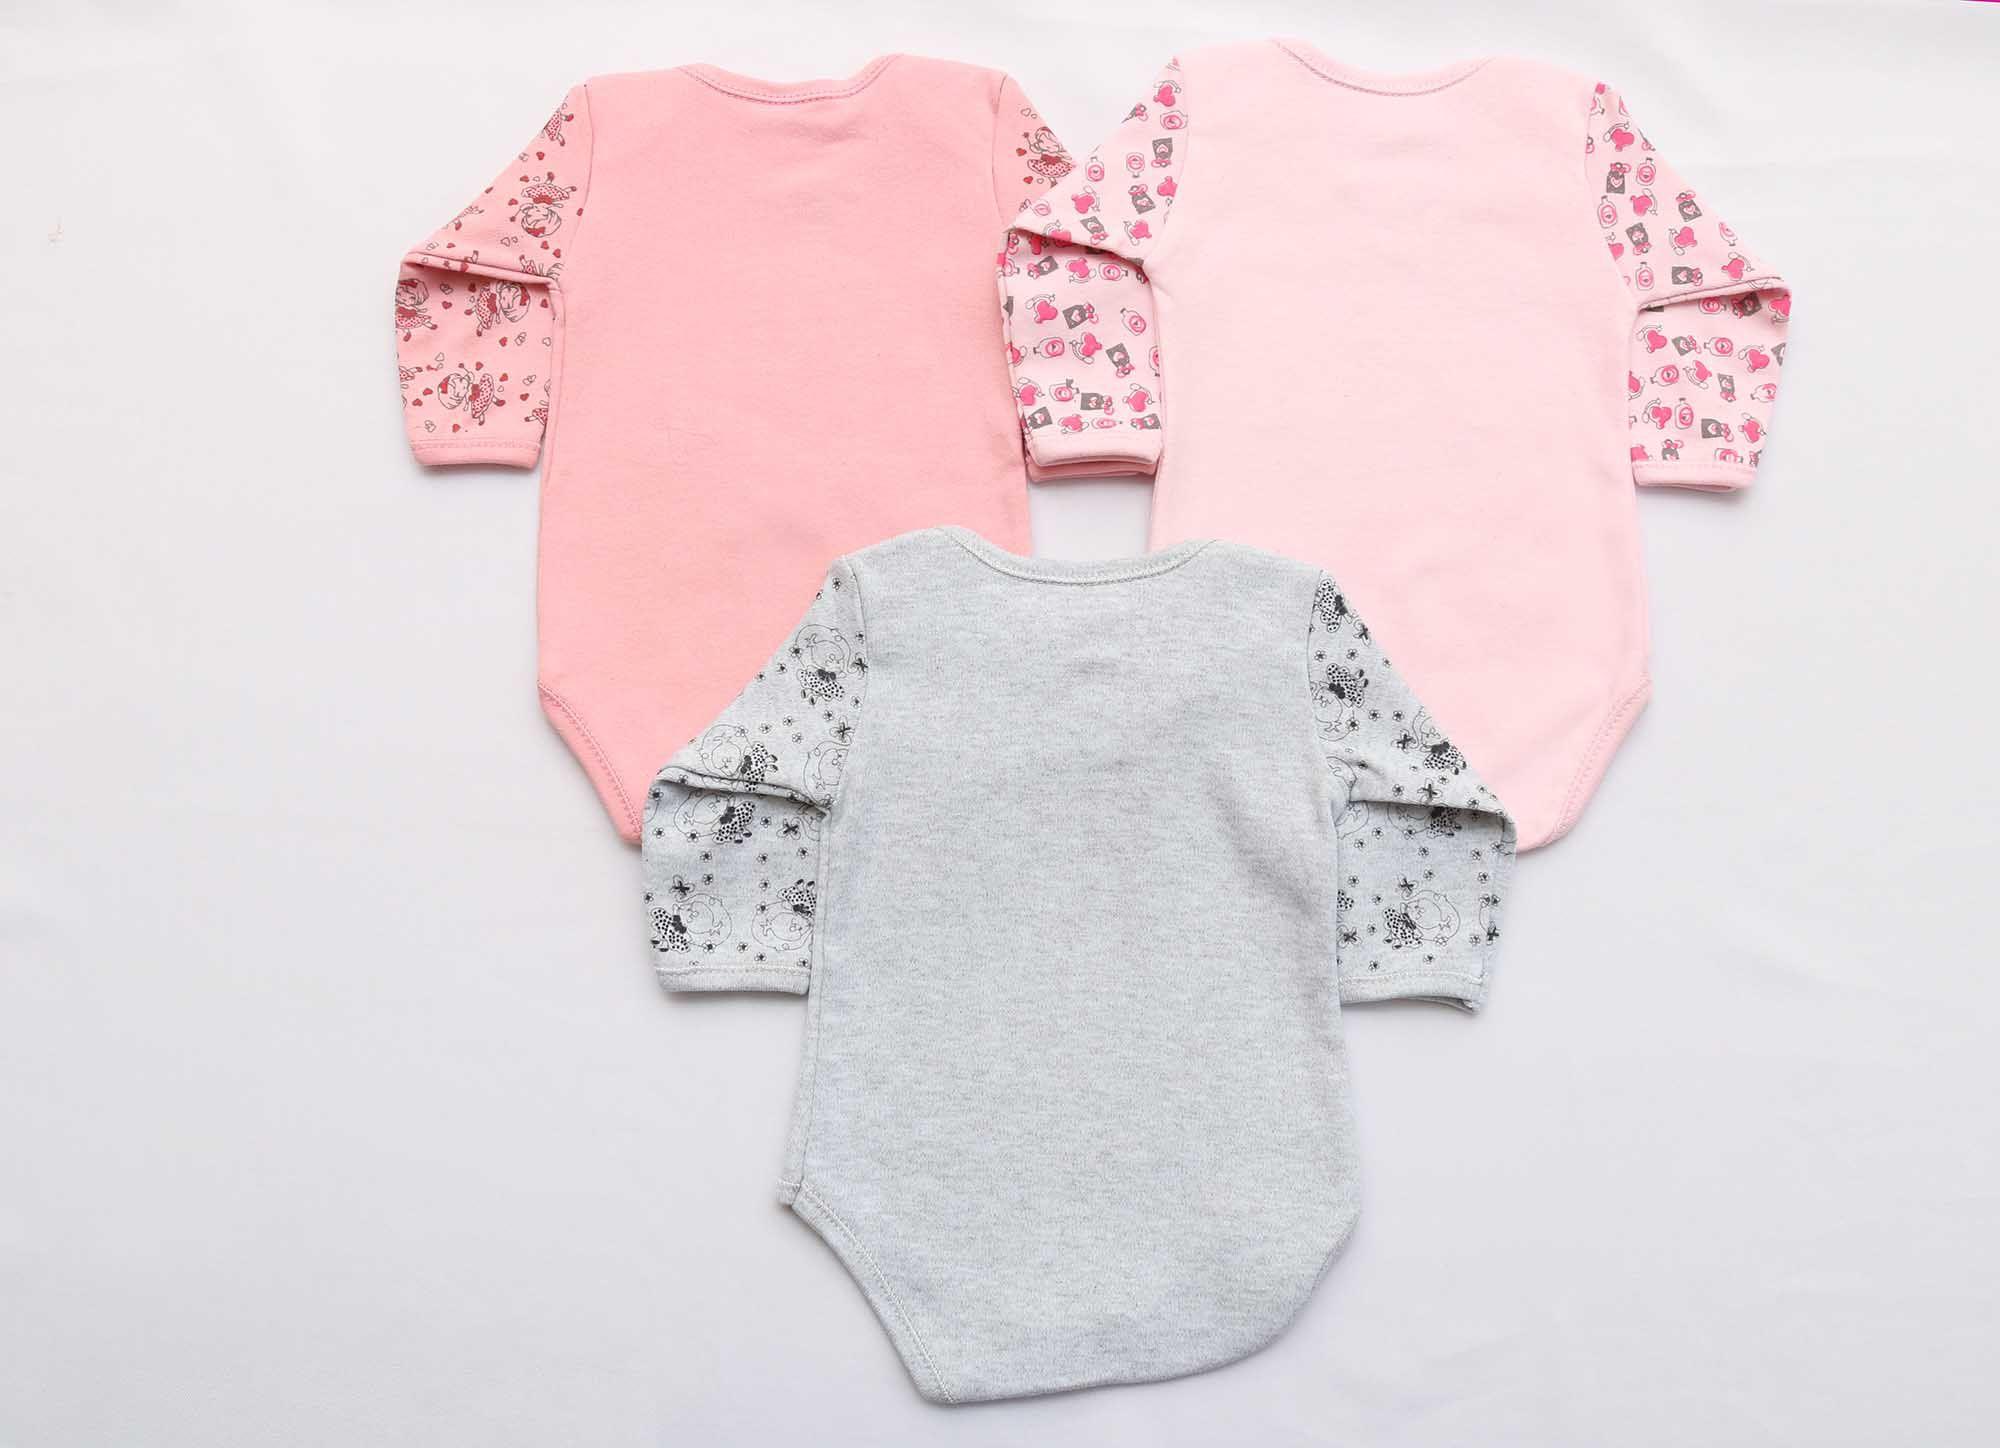 Kit Body Bebê 3 Peças Menina Rosa, Rosê e Mescla Fada